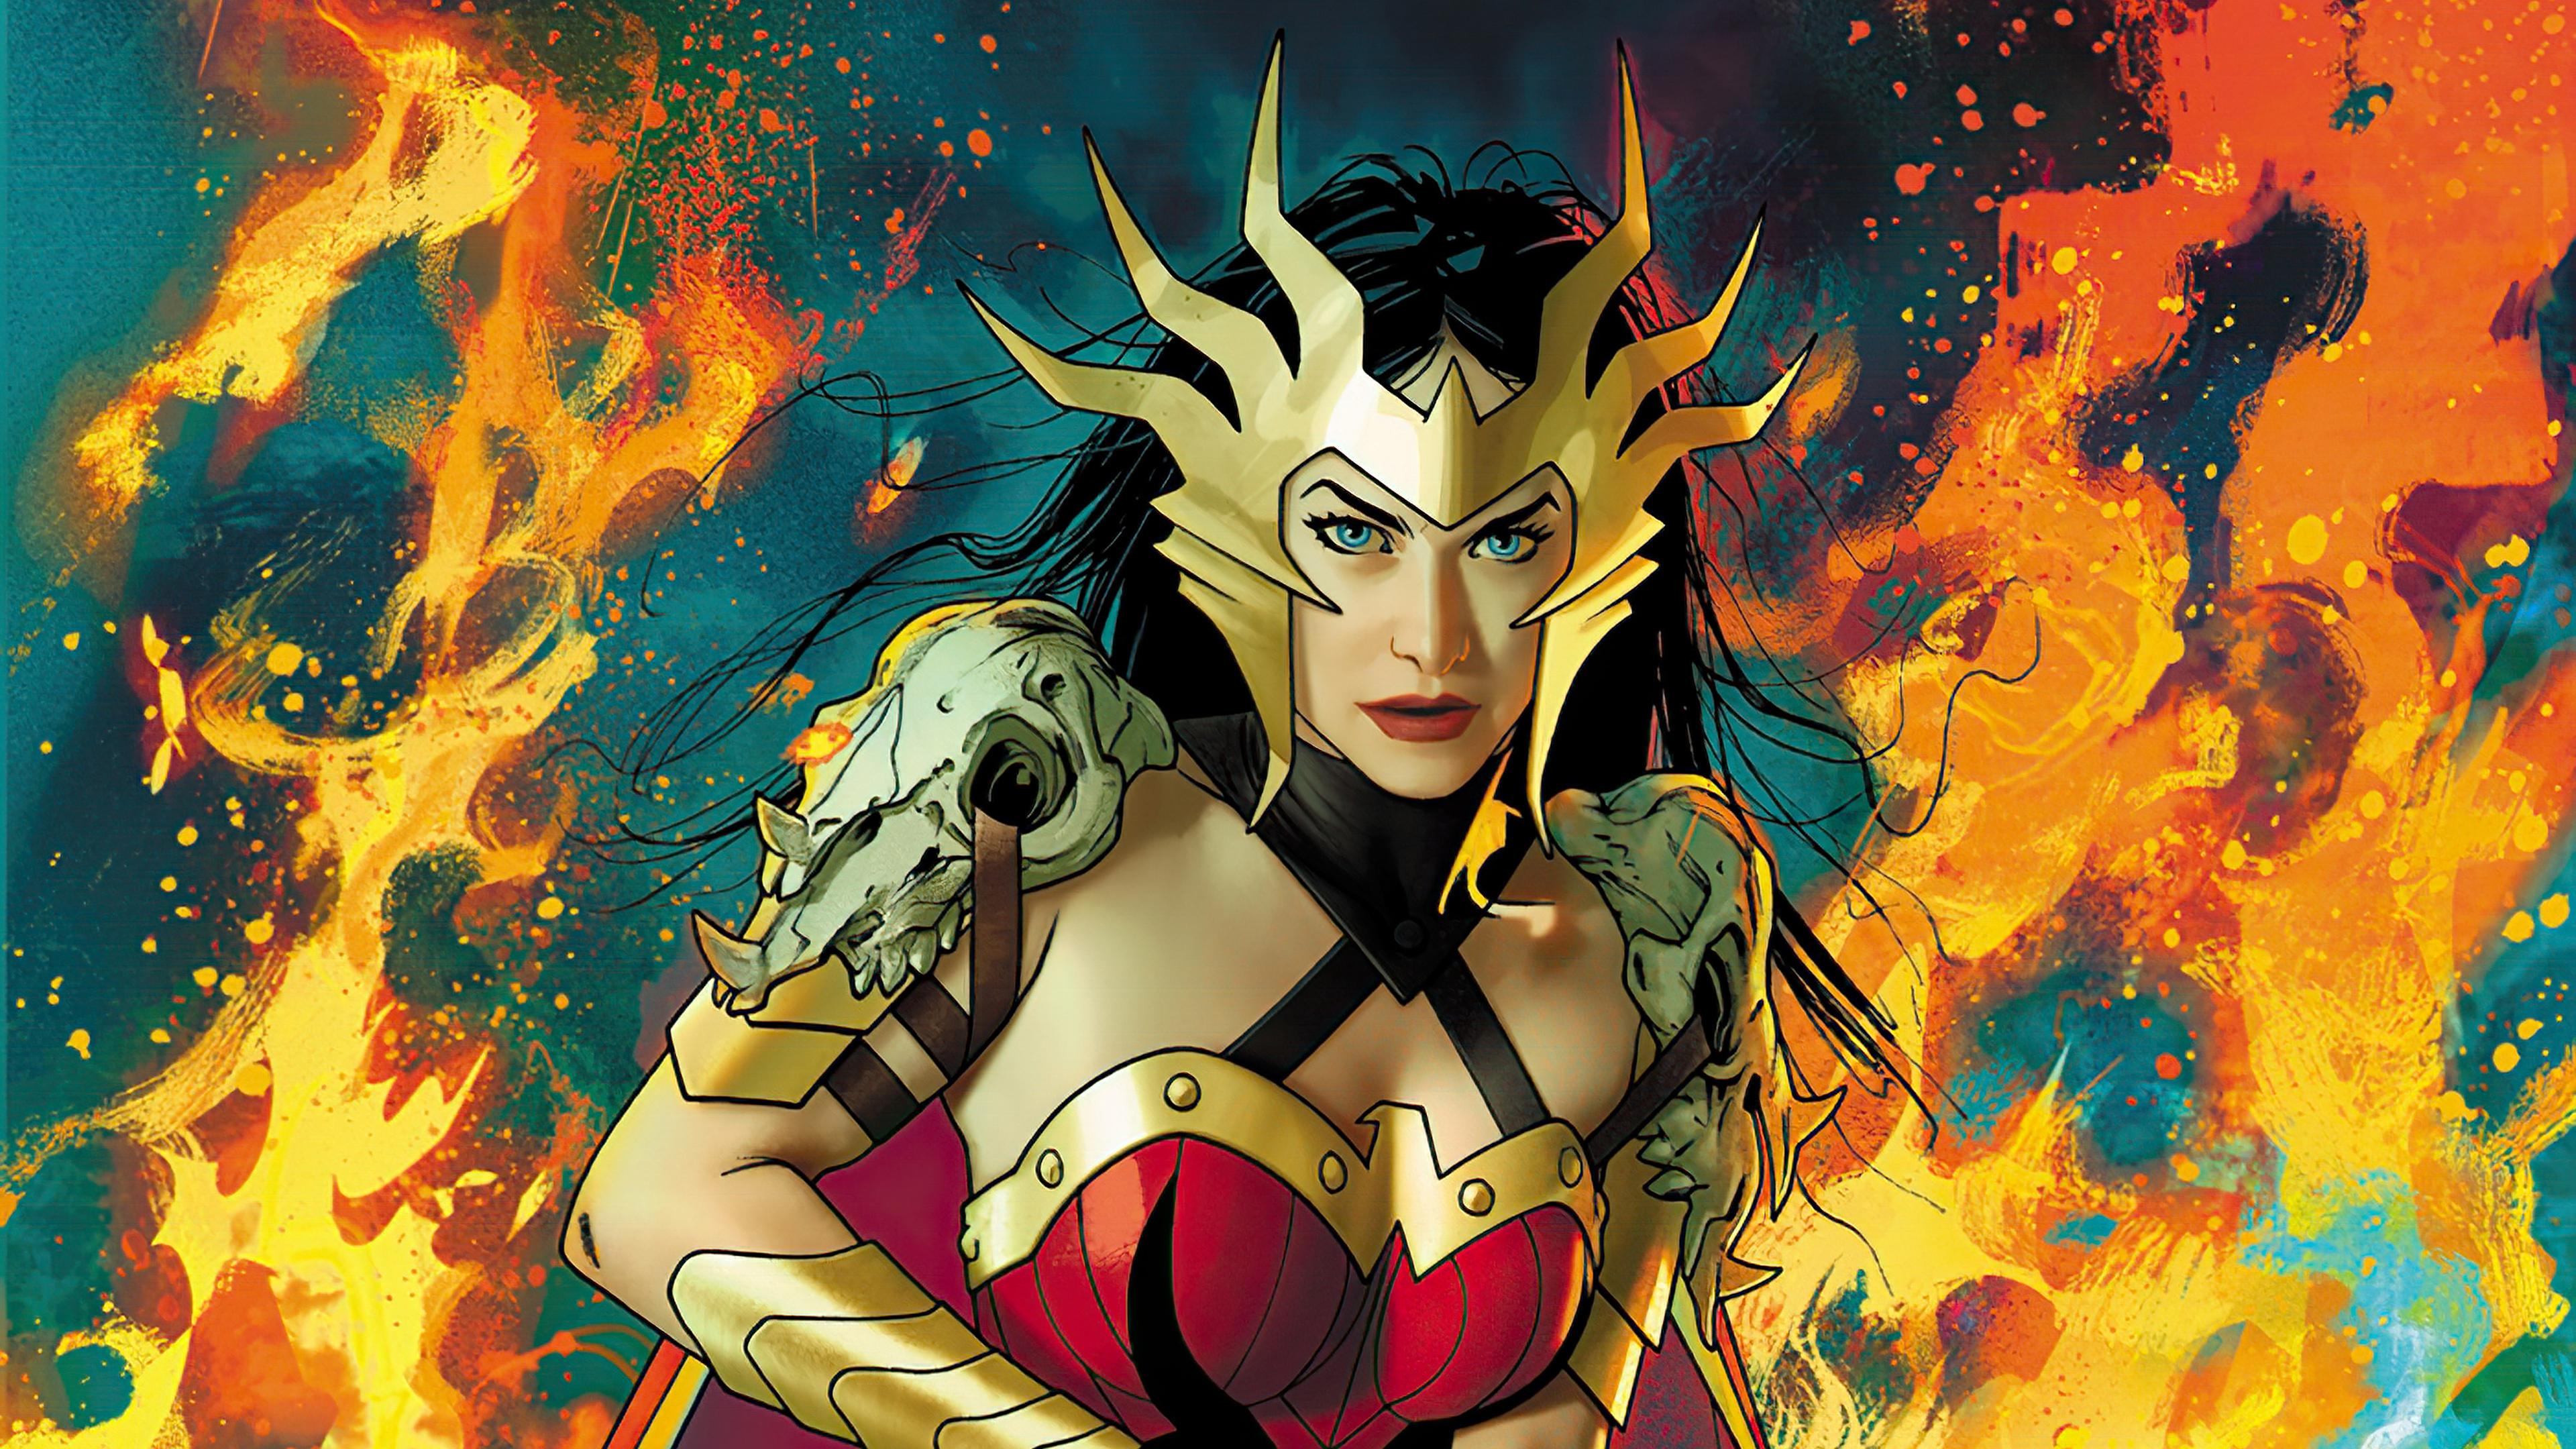 deathmetal wonder woman cover 4k 1619216040 - Deathmetal Wonder Woman Cover 4k - Deathmetal Wonder Woman Cover 4k wallpapers